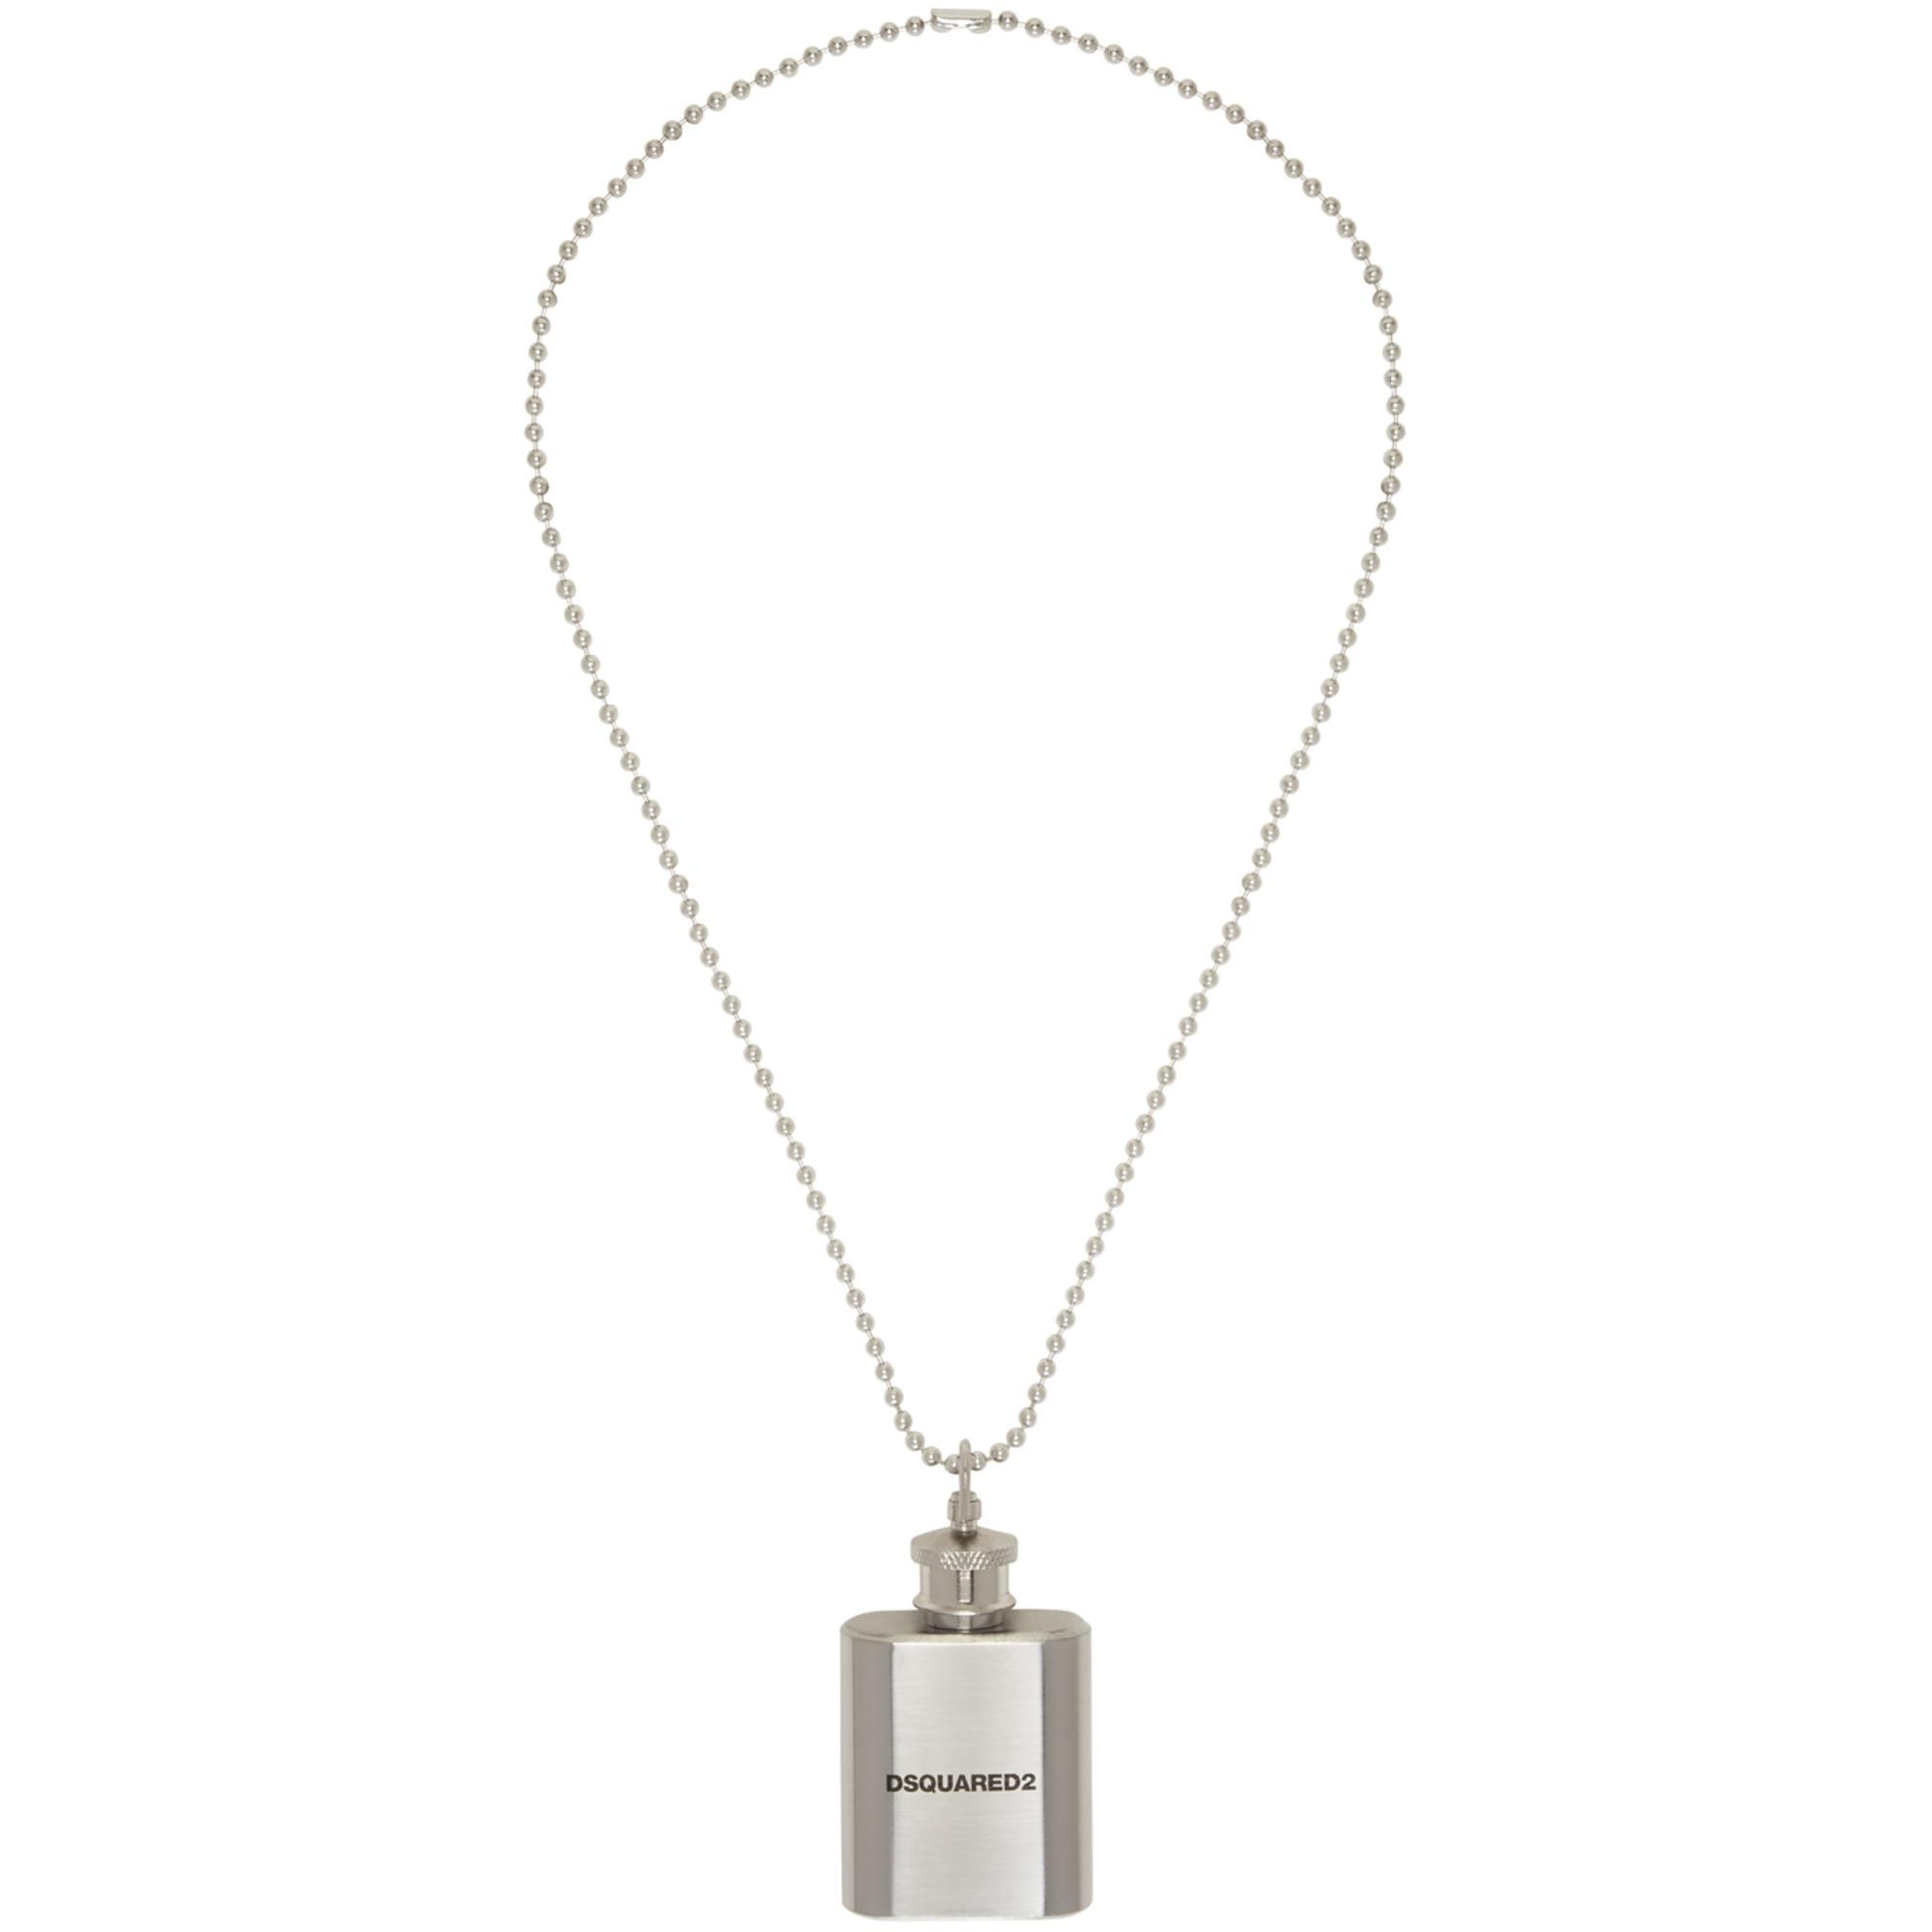 Dsquared2 charm pendant ball chain - Metallic 1uz1Cm